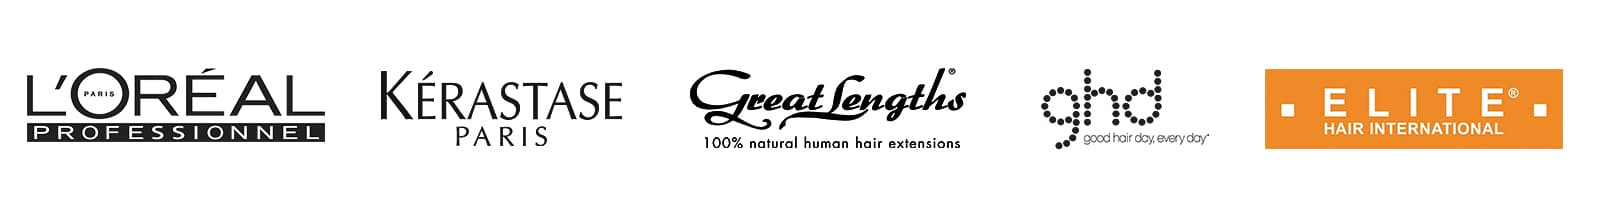 partenaires-coiffure rouen